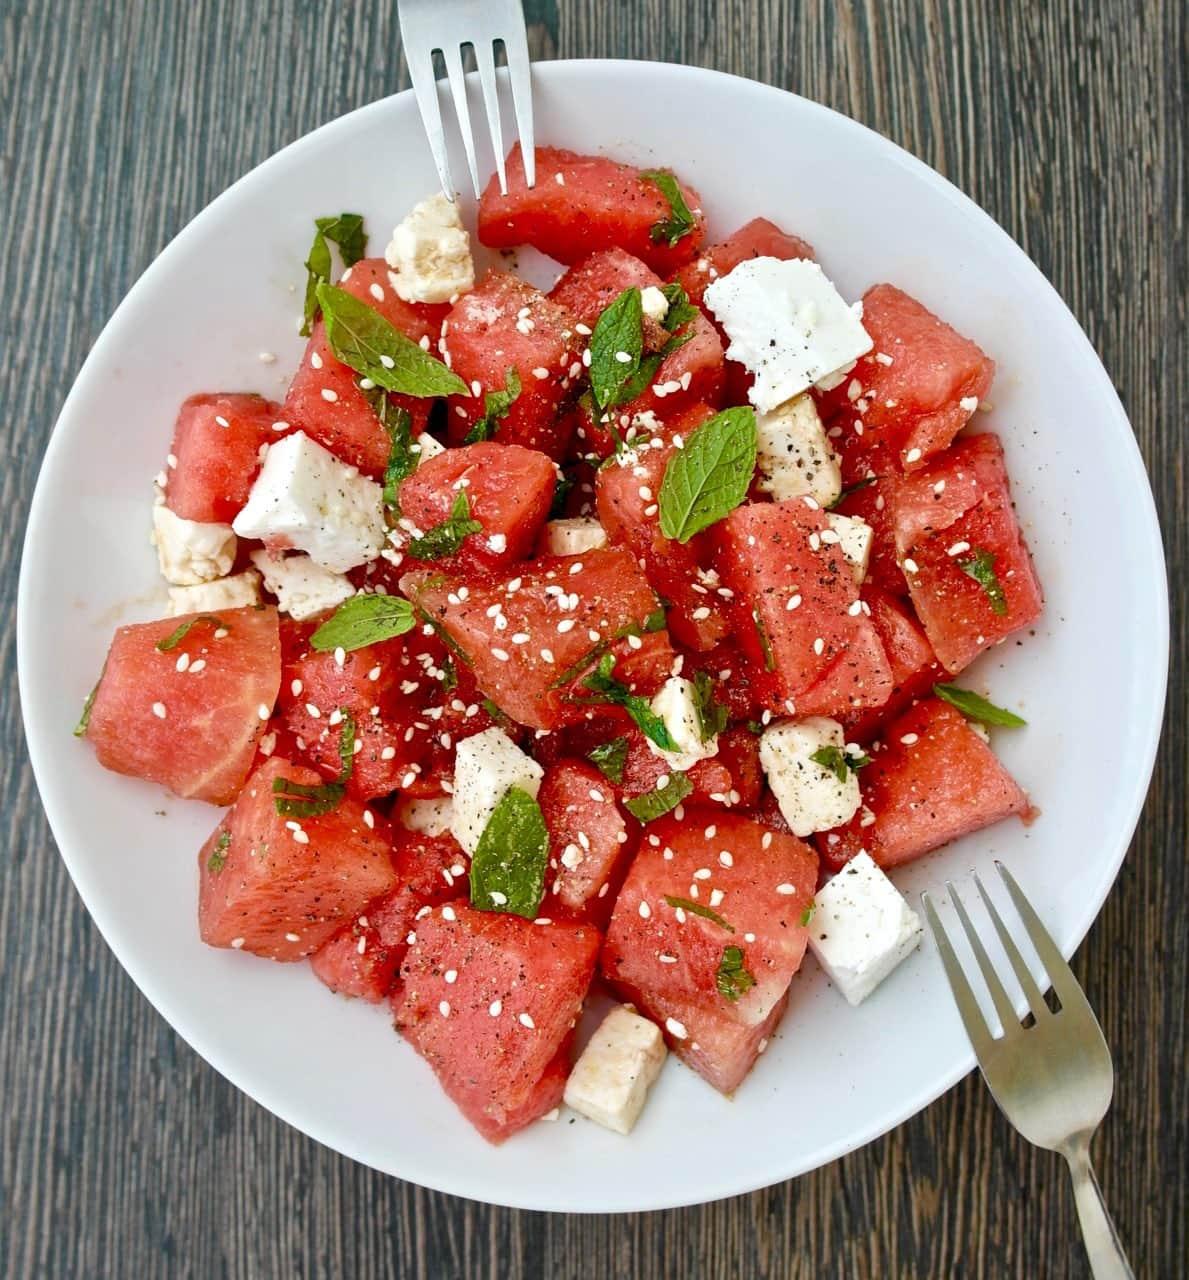 Watermelon And Feta Salad With Honey Balsamic Vinaigrette